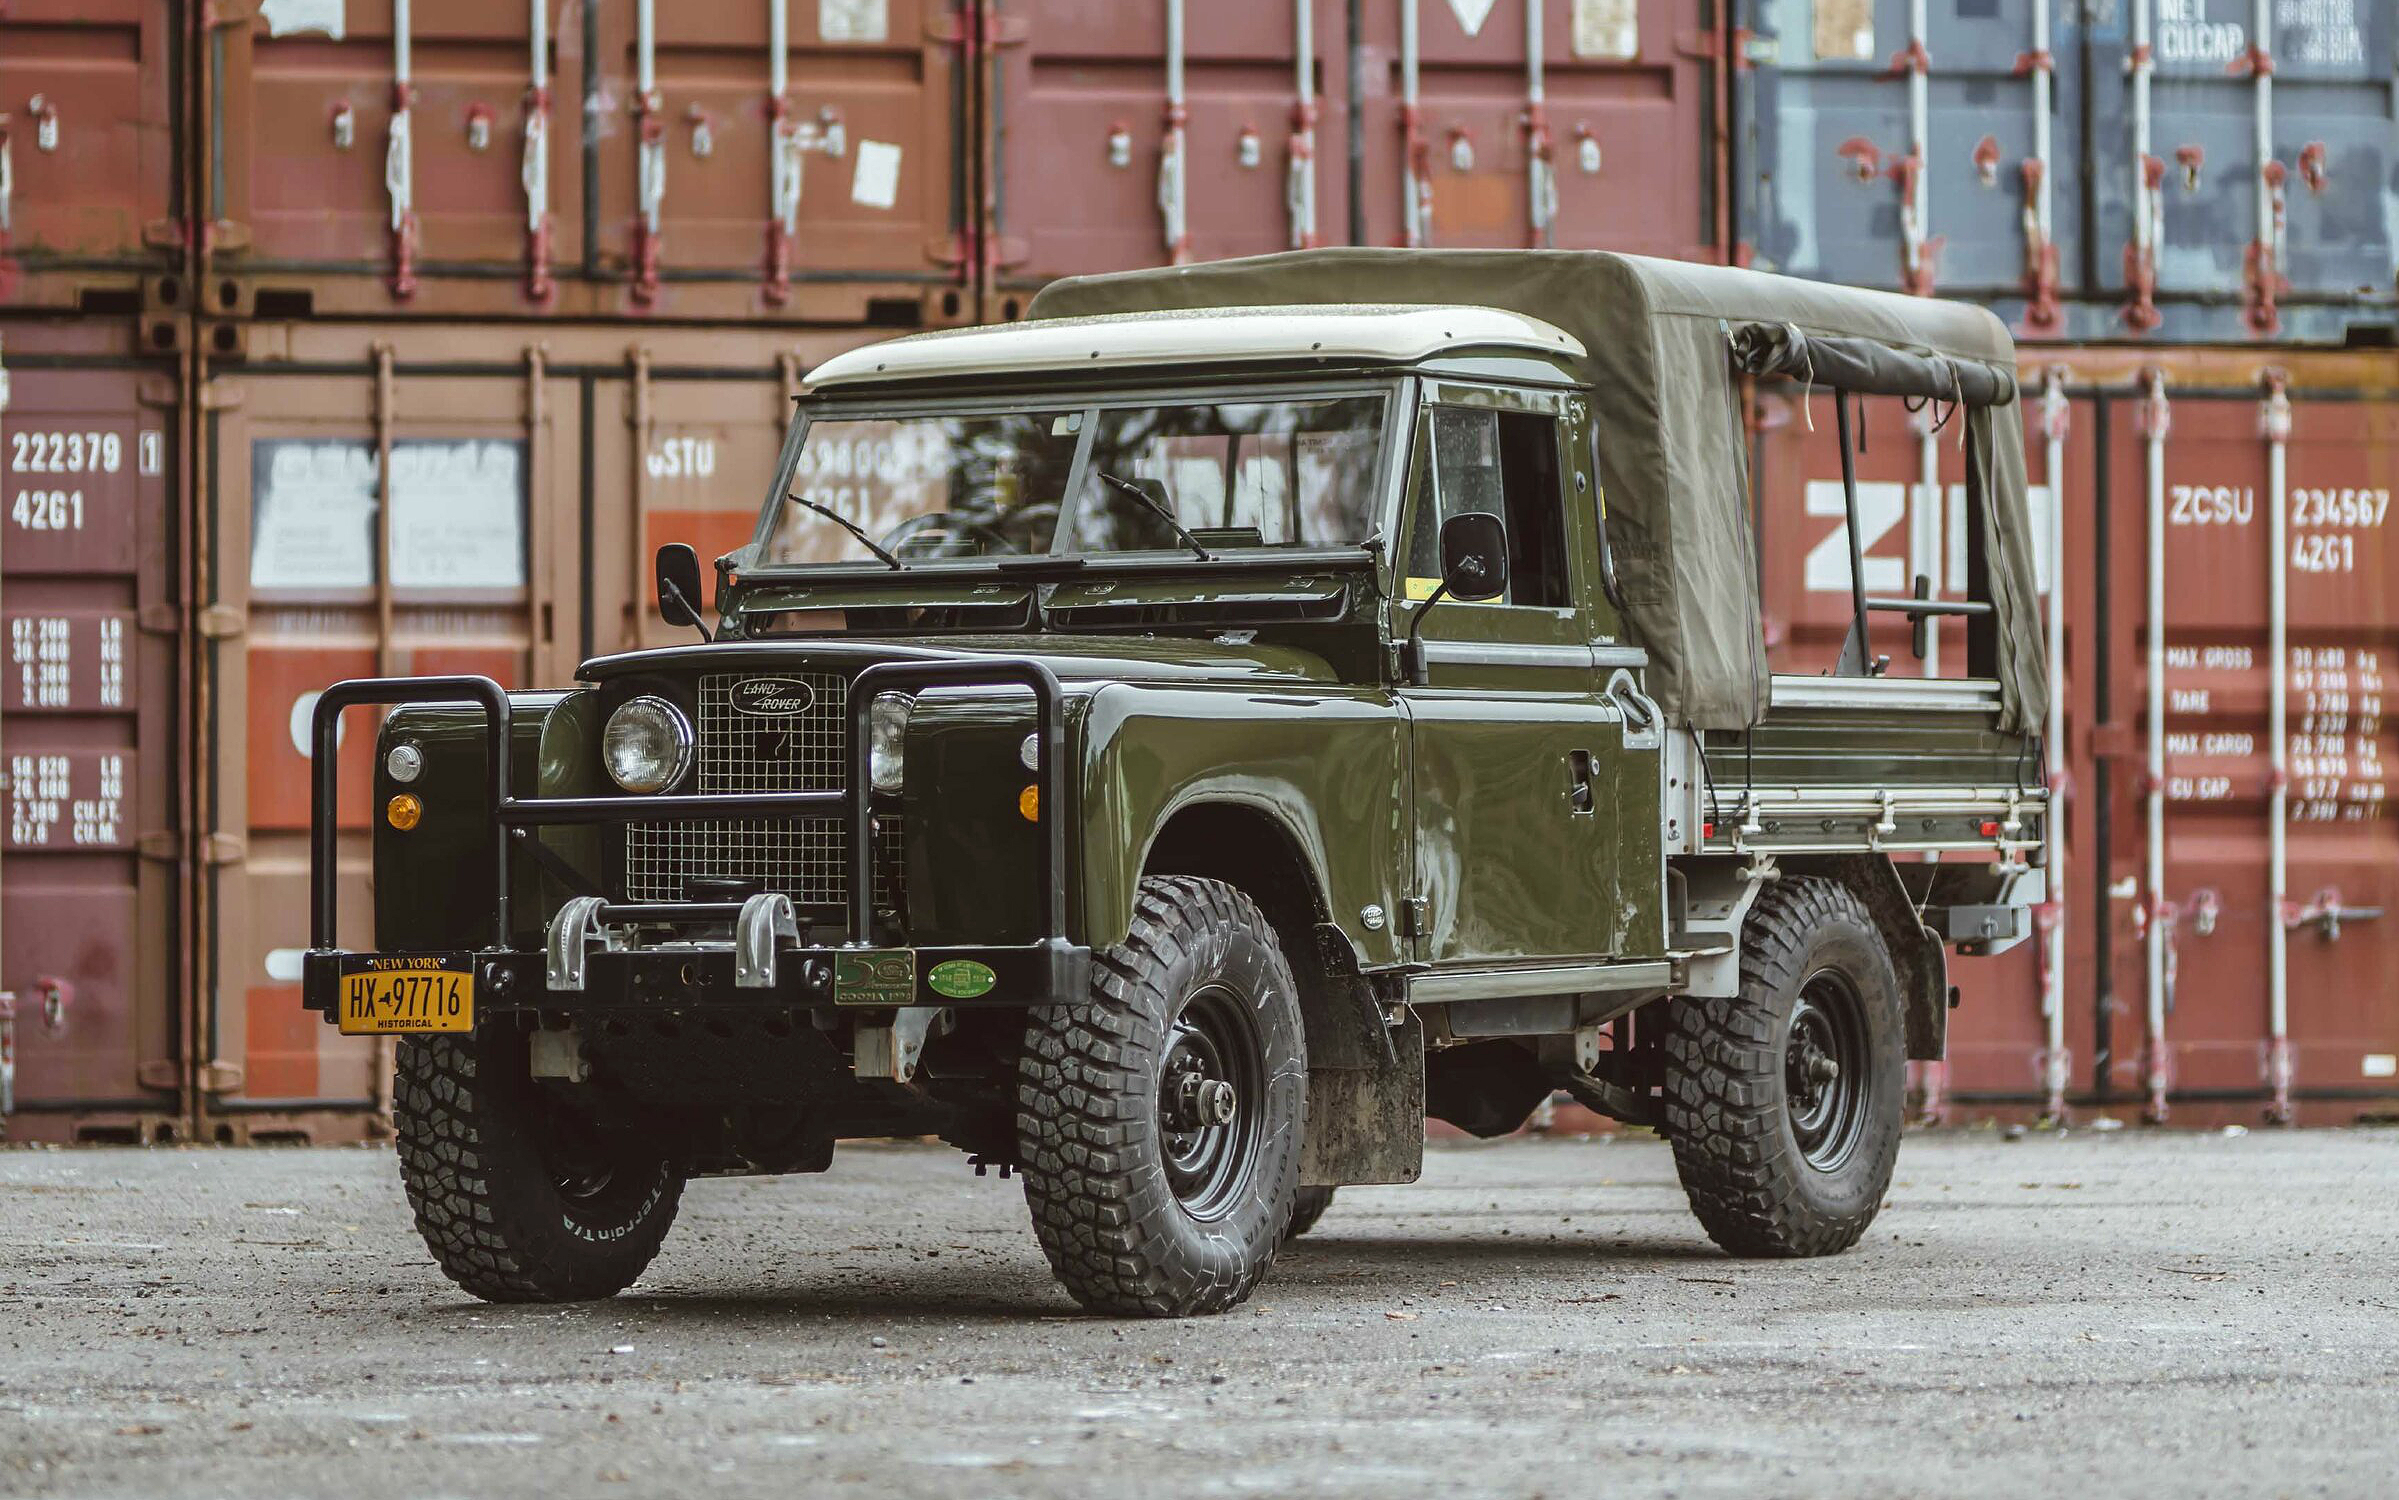 1958 Land Rover Series II UTE